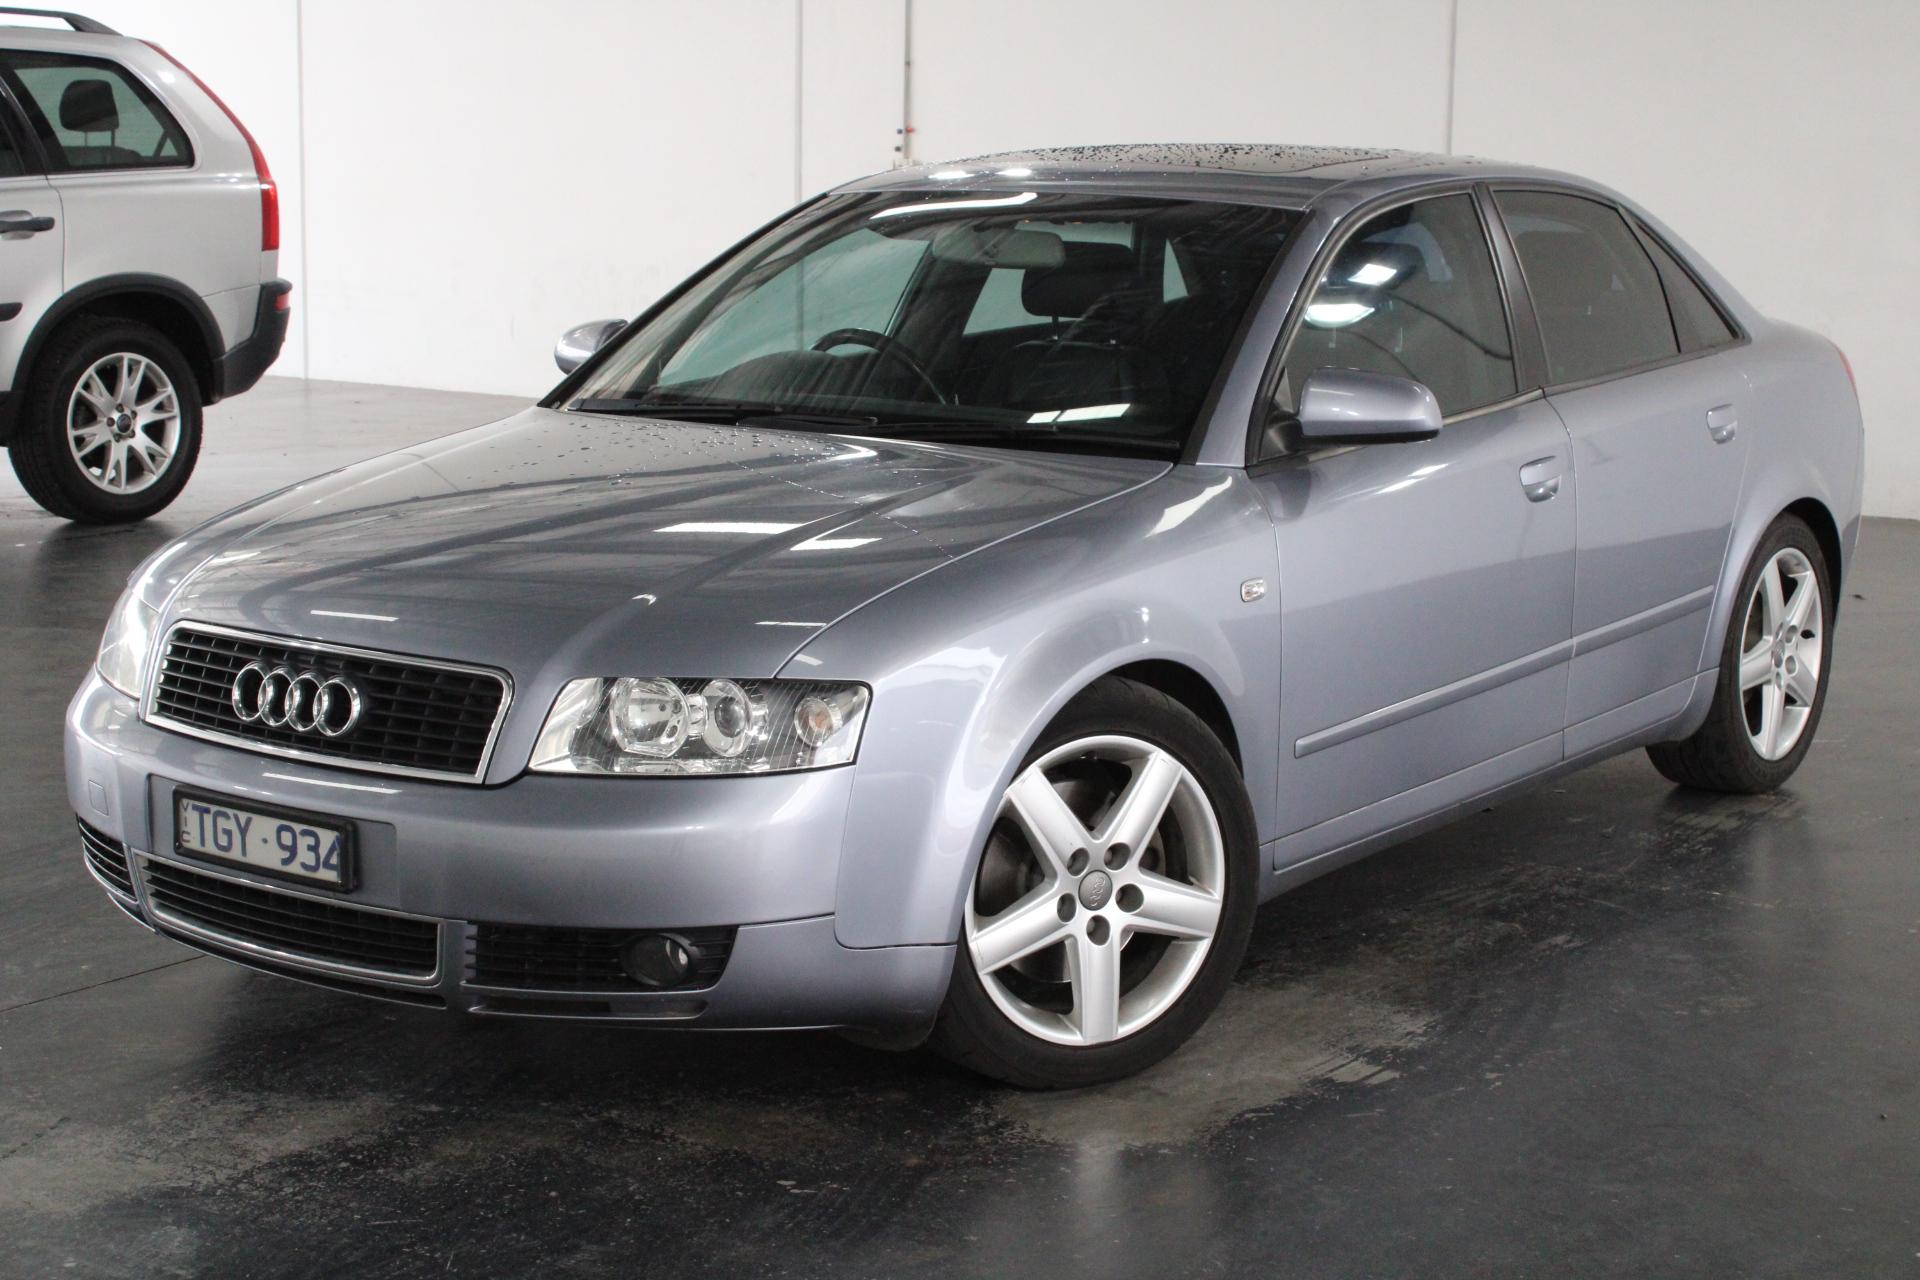 2004 Audi A4 1.8T B6 CVT Sedan